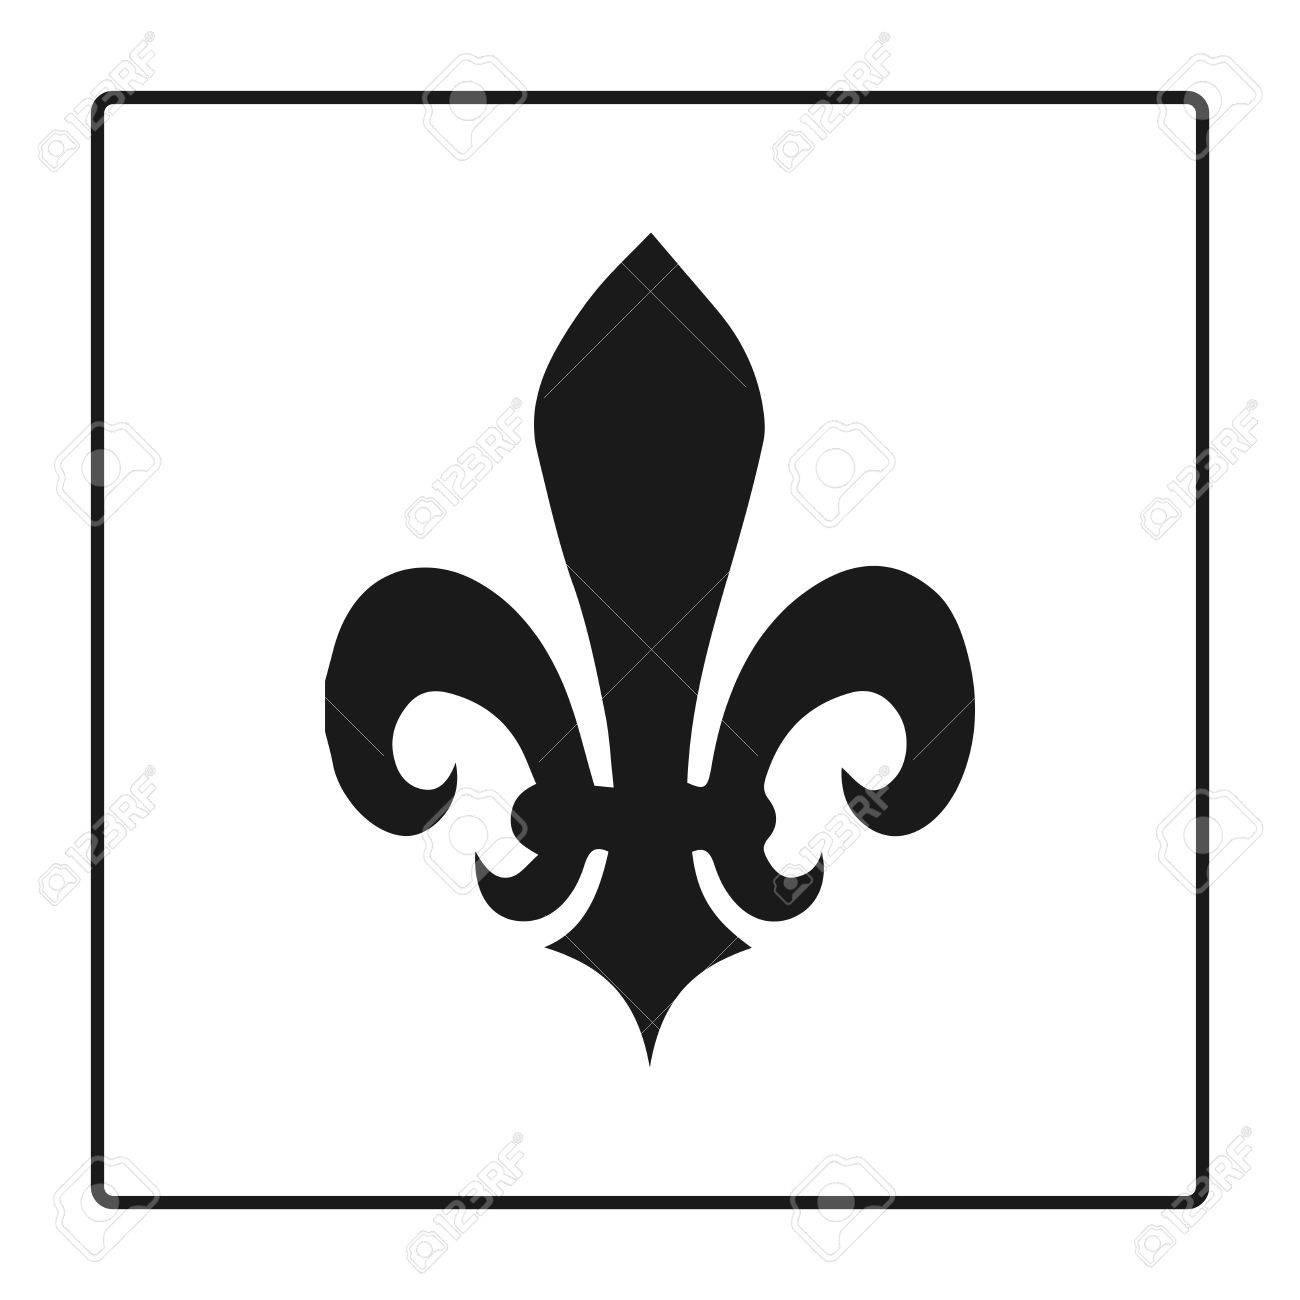 Fleur de lis symbol silhouette heraldic symbol vector fleur de lis symbol silhouette heraldic symbol vector illustration medieval sign biocorpaavc